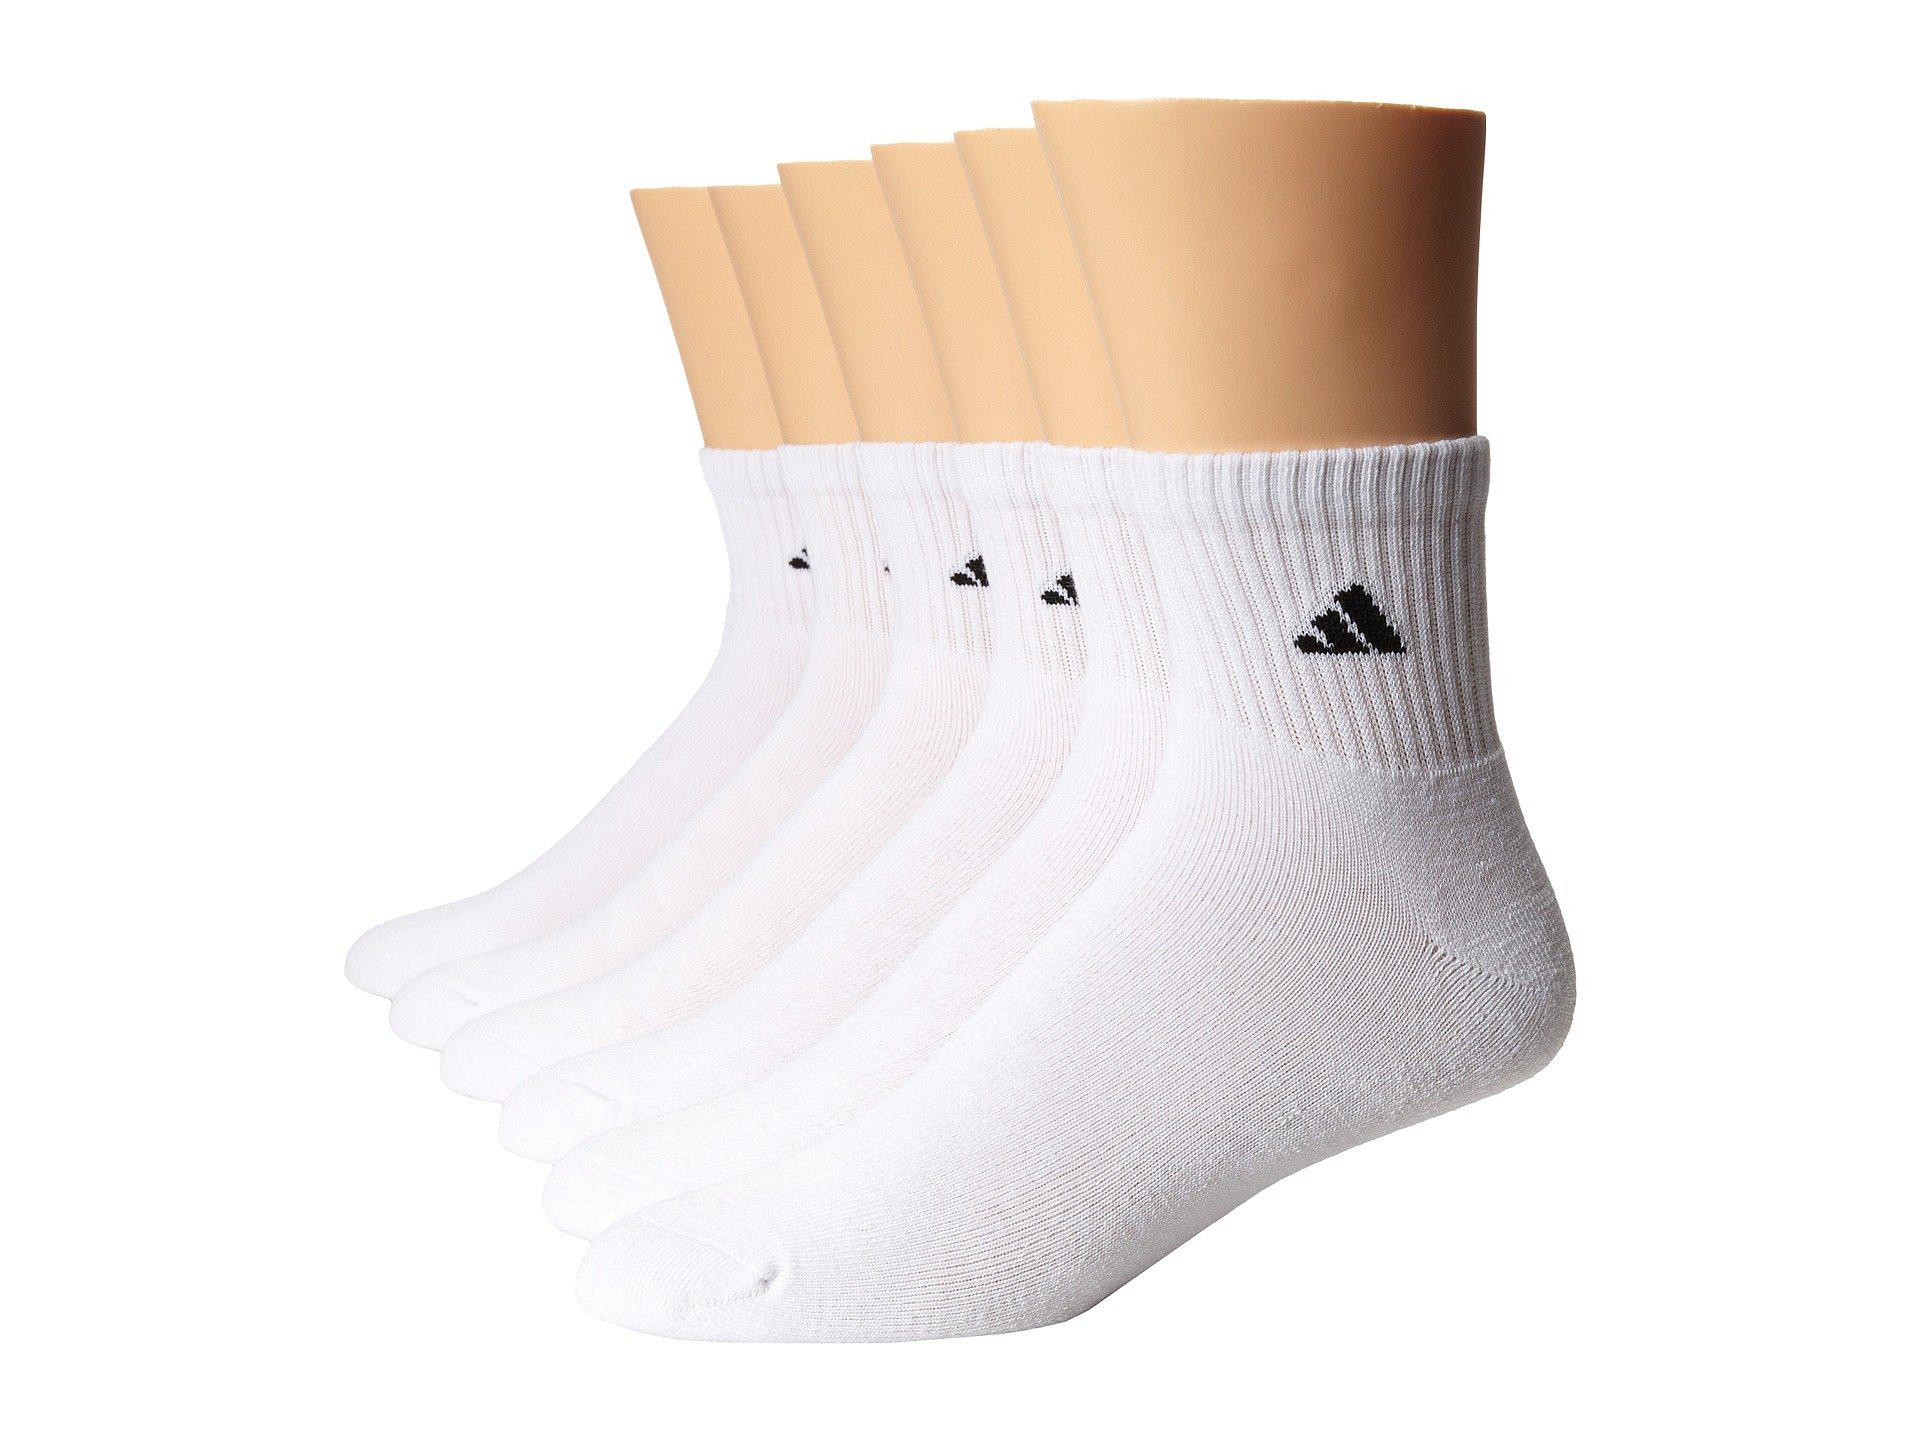 Adidas 6 Pack Quarter Socks